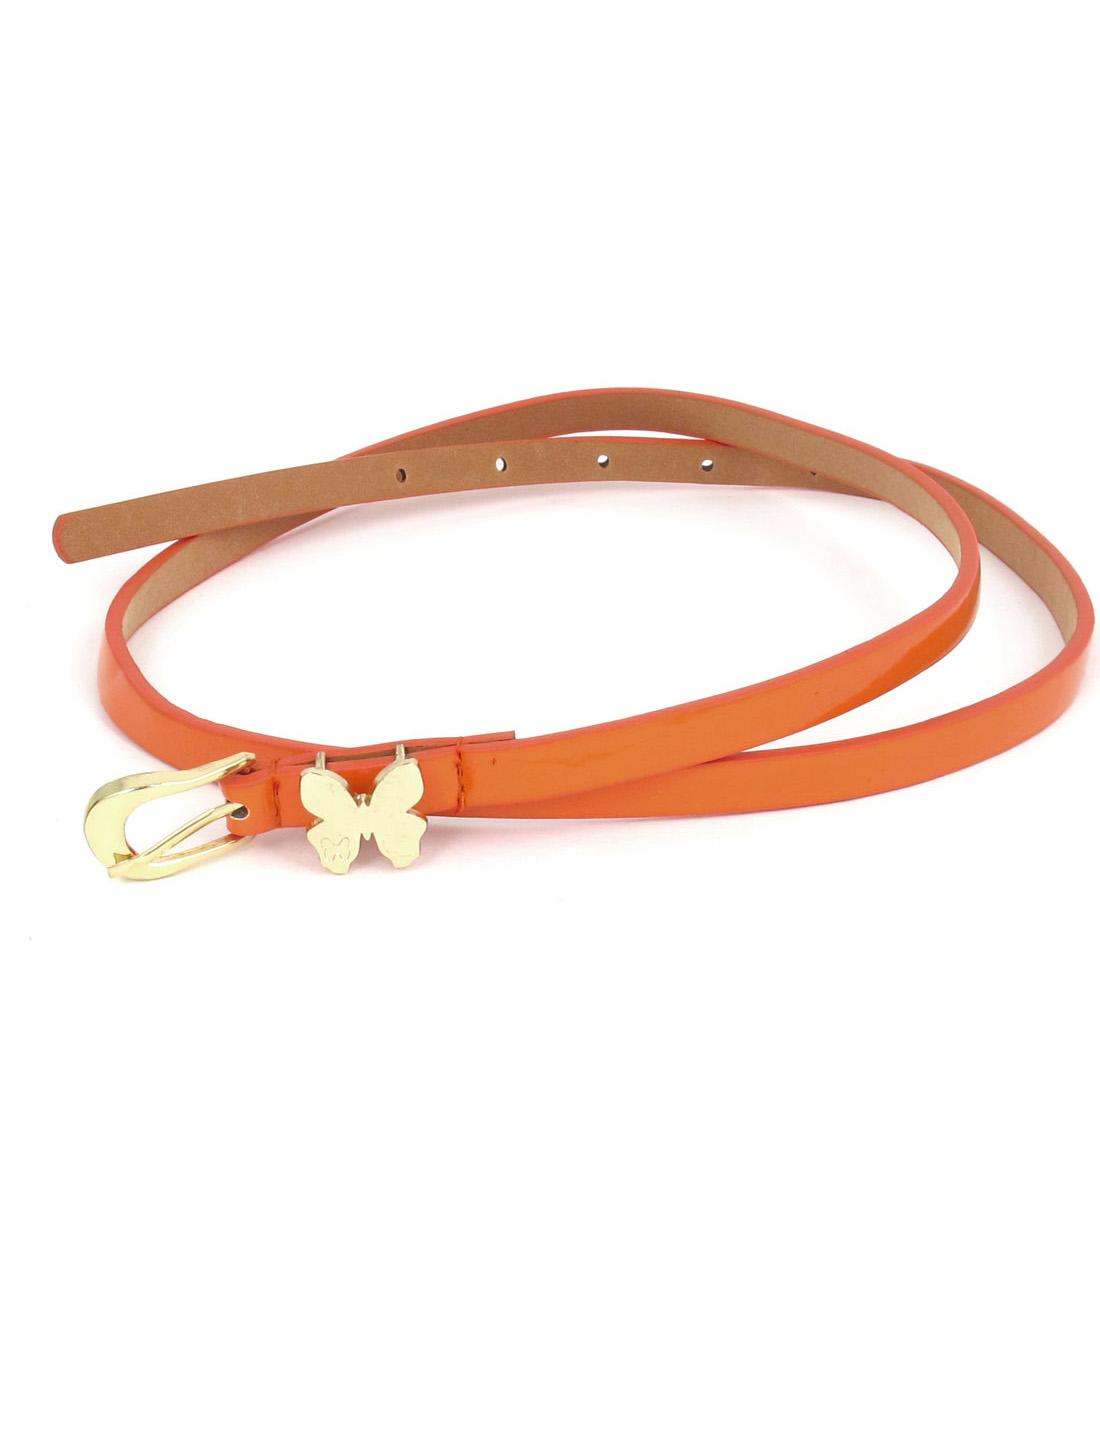 Women Butterfly Shaped Metal Single Pin Buckle Perforated Adjustable Faux Leather Waist Belt Waistbelt Orange